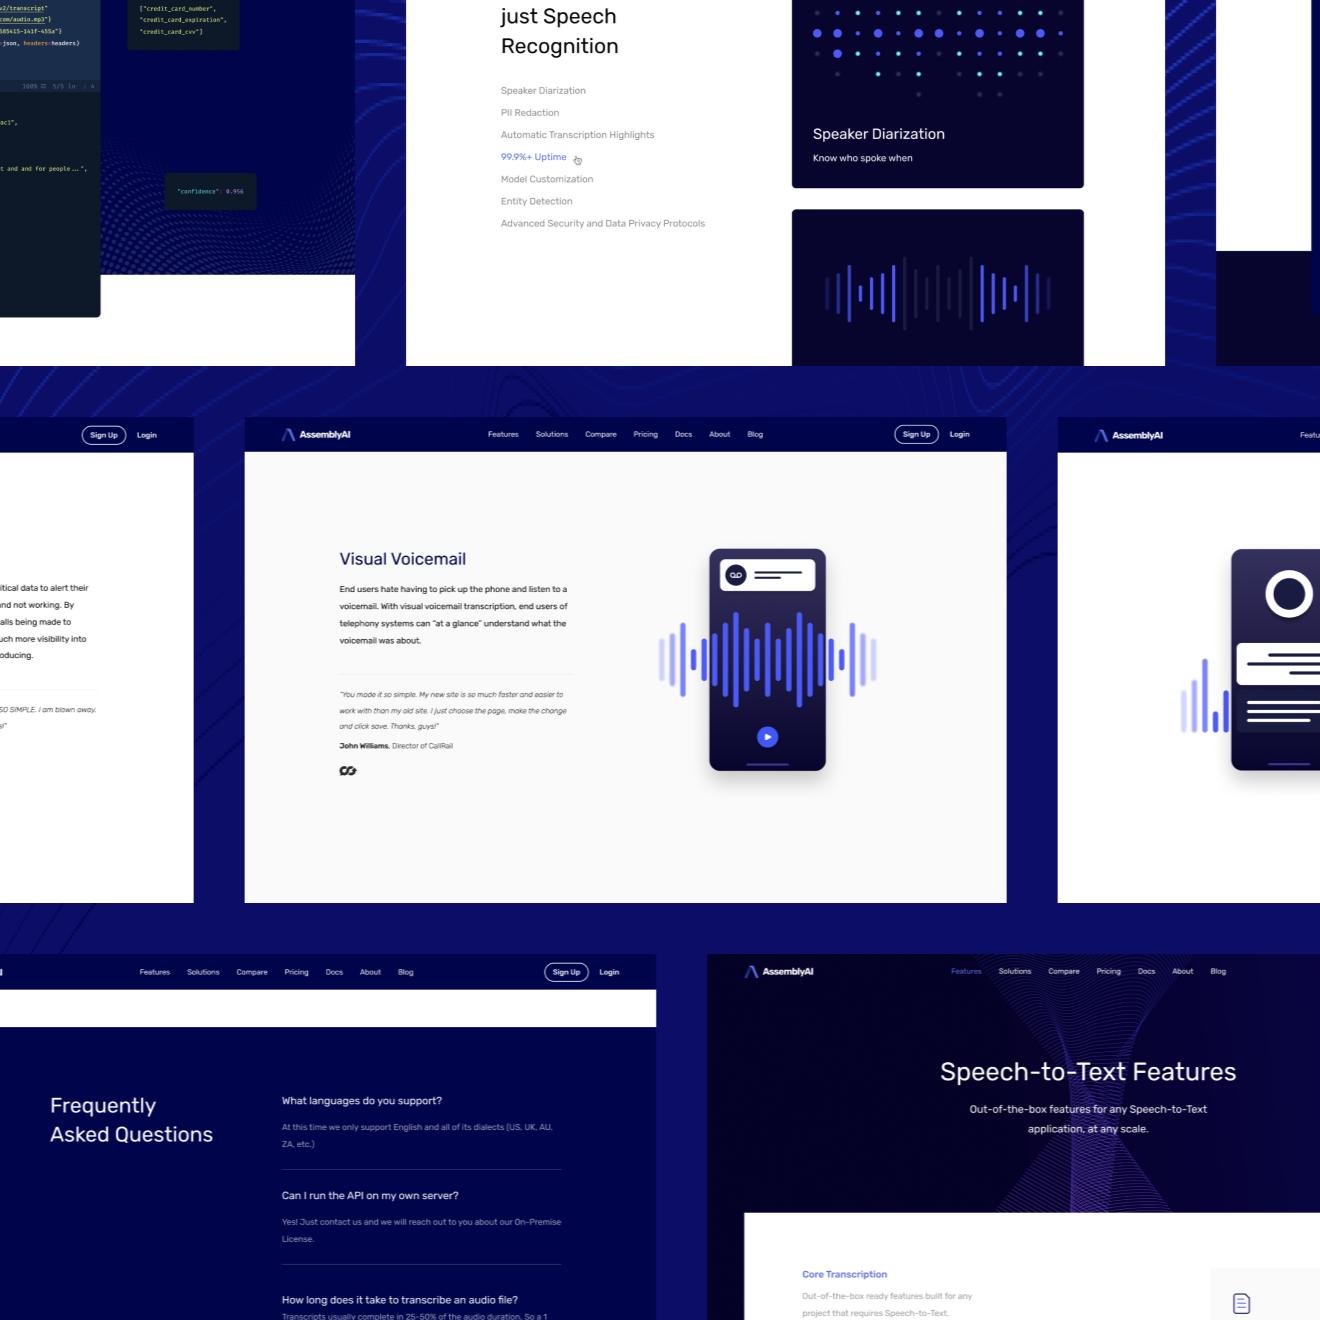 AssemblyAI website made by Refokus